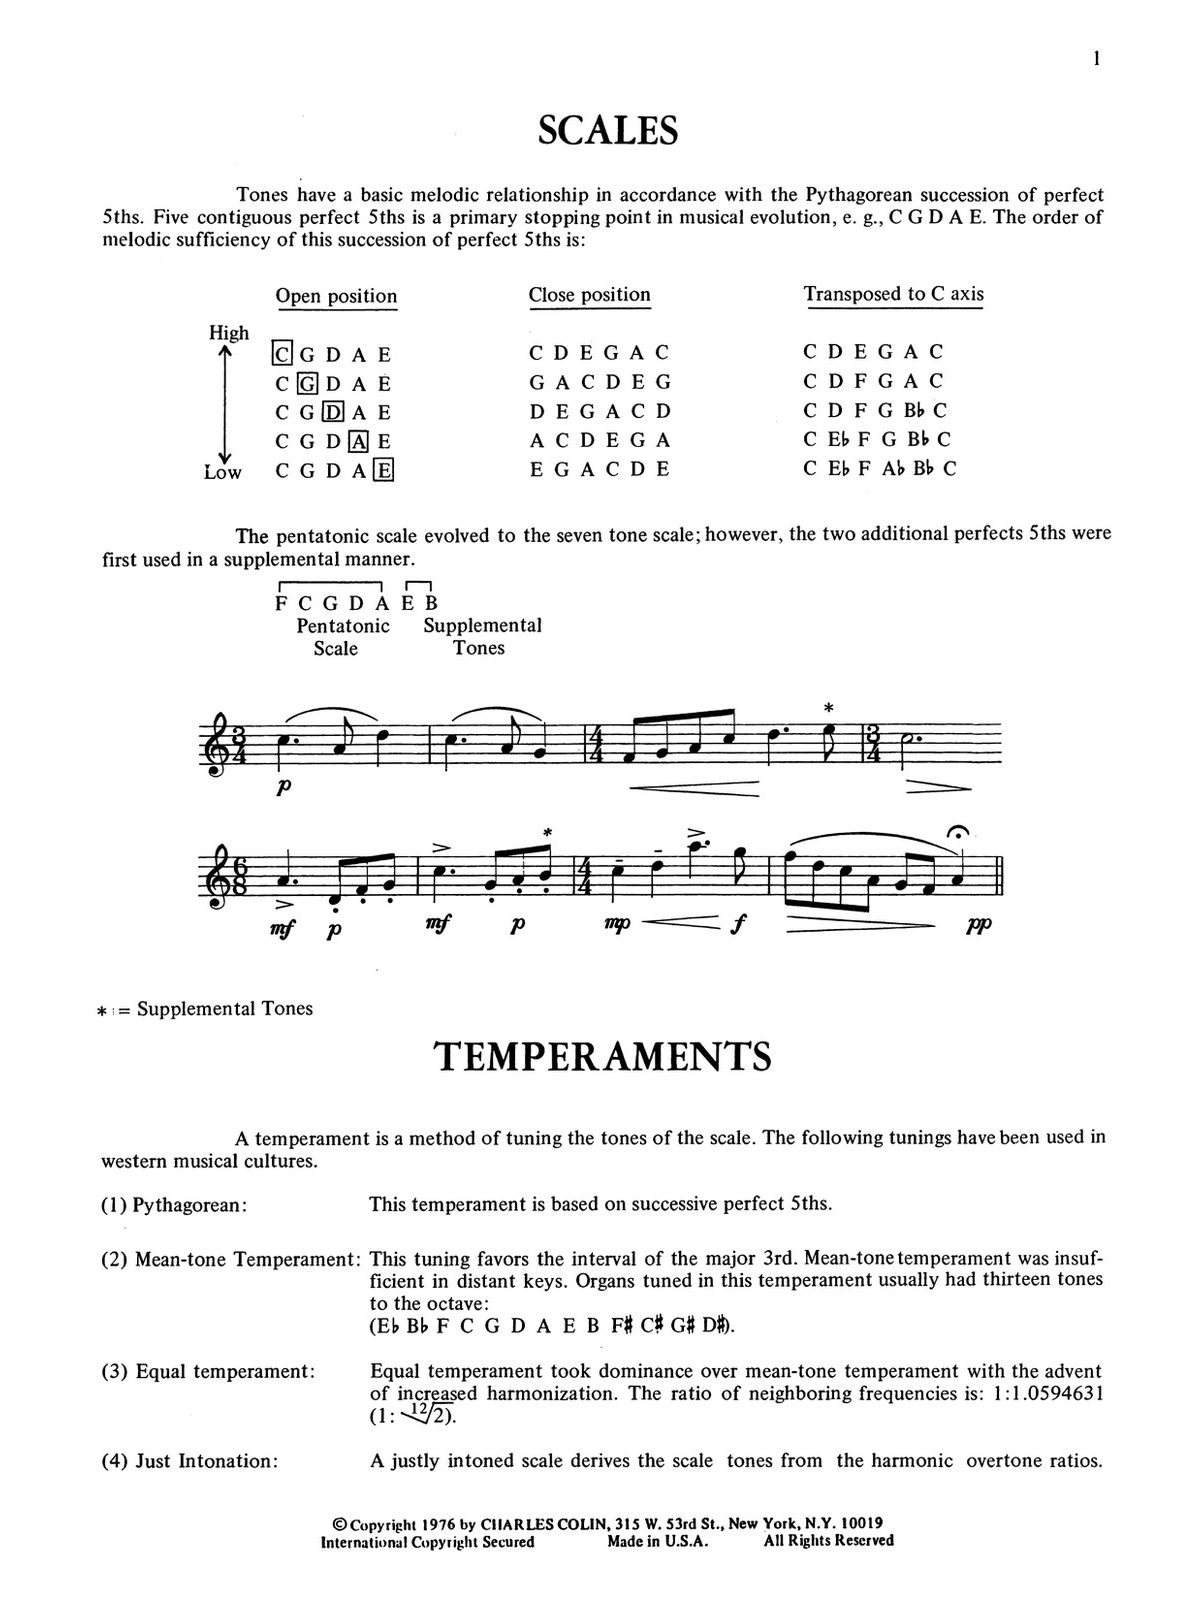 Deutsch, Lexicon of Symmetric Scales and Tonal Patterns-p03